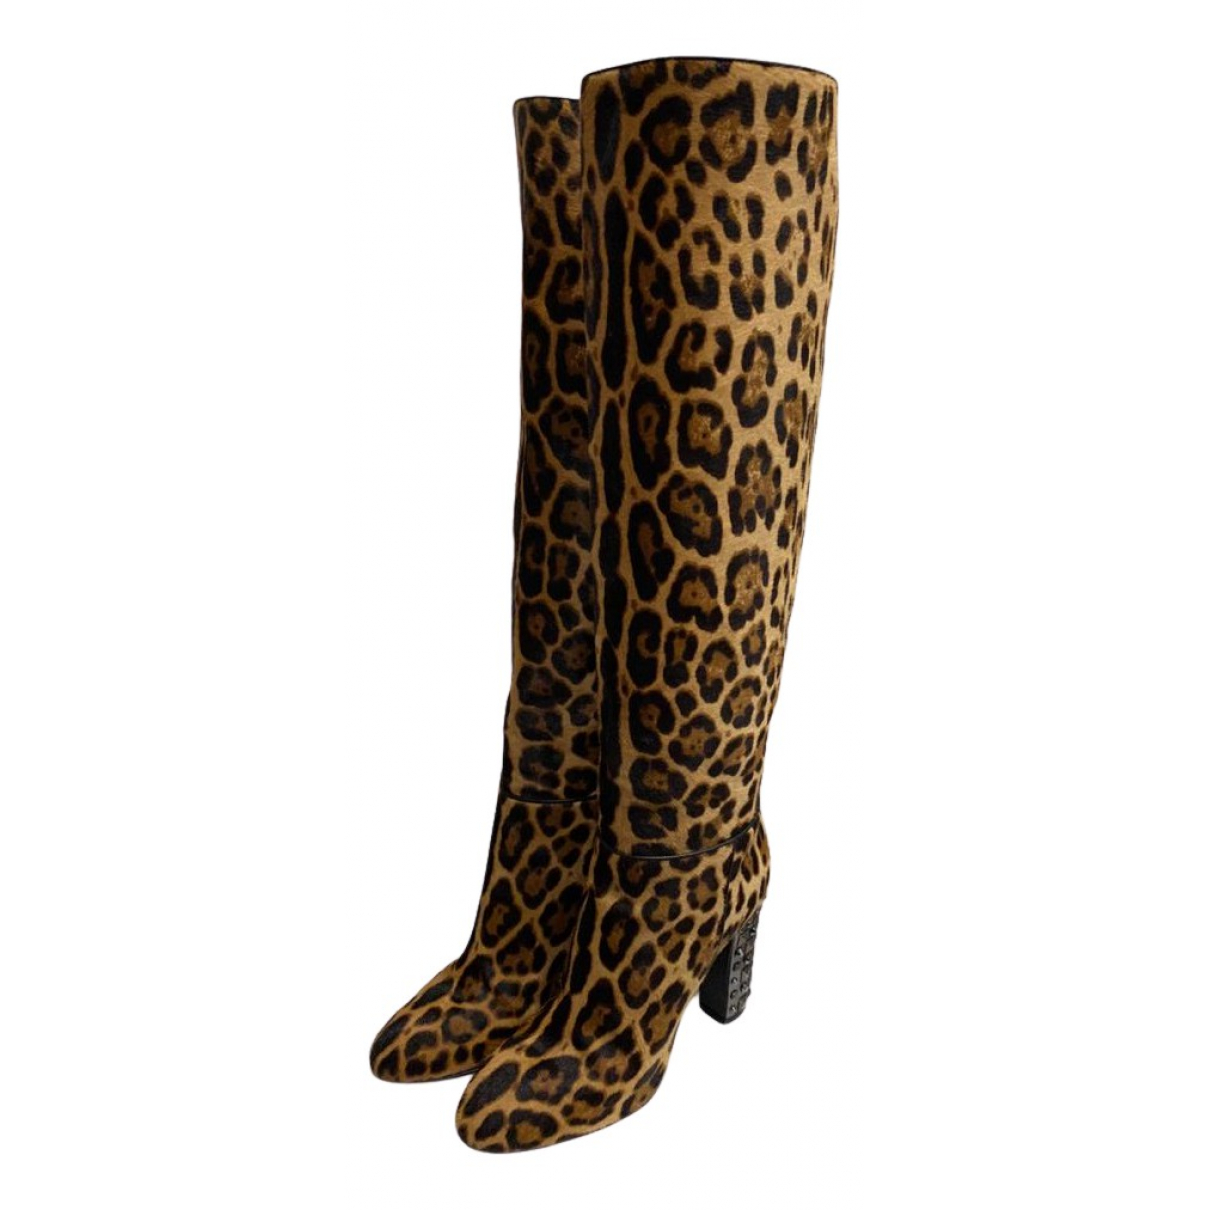 Dolce & Gabbana N Multicolour Pony-style calfskin Boots for Women 37.5 EU